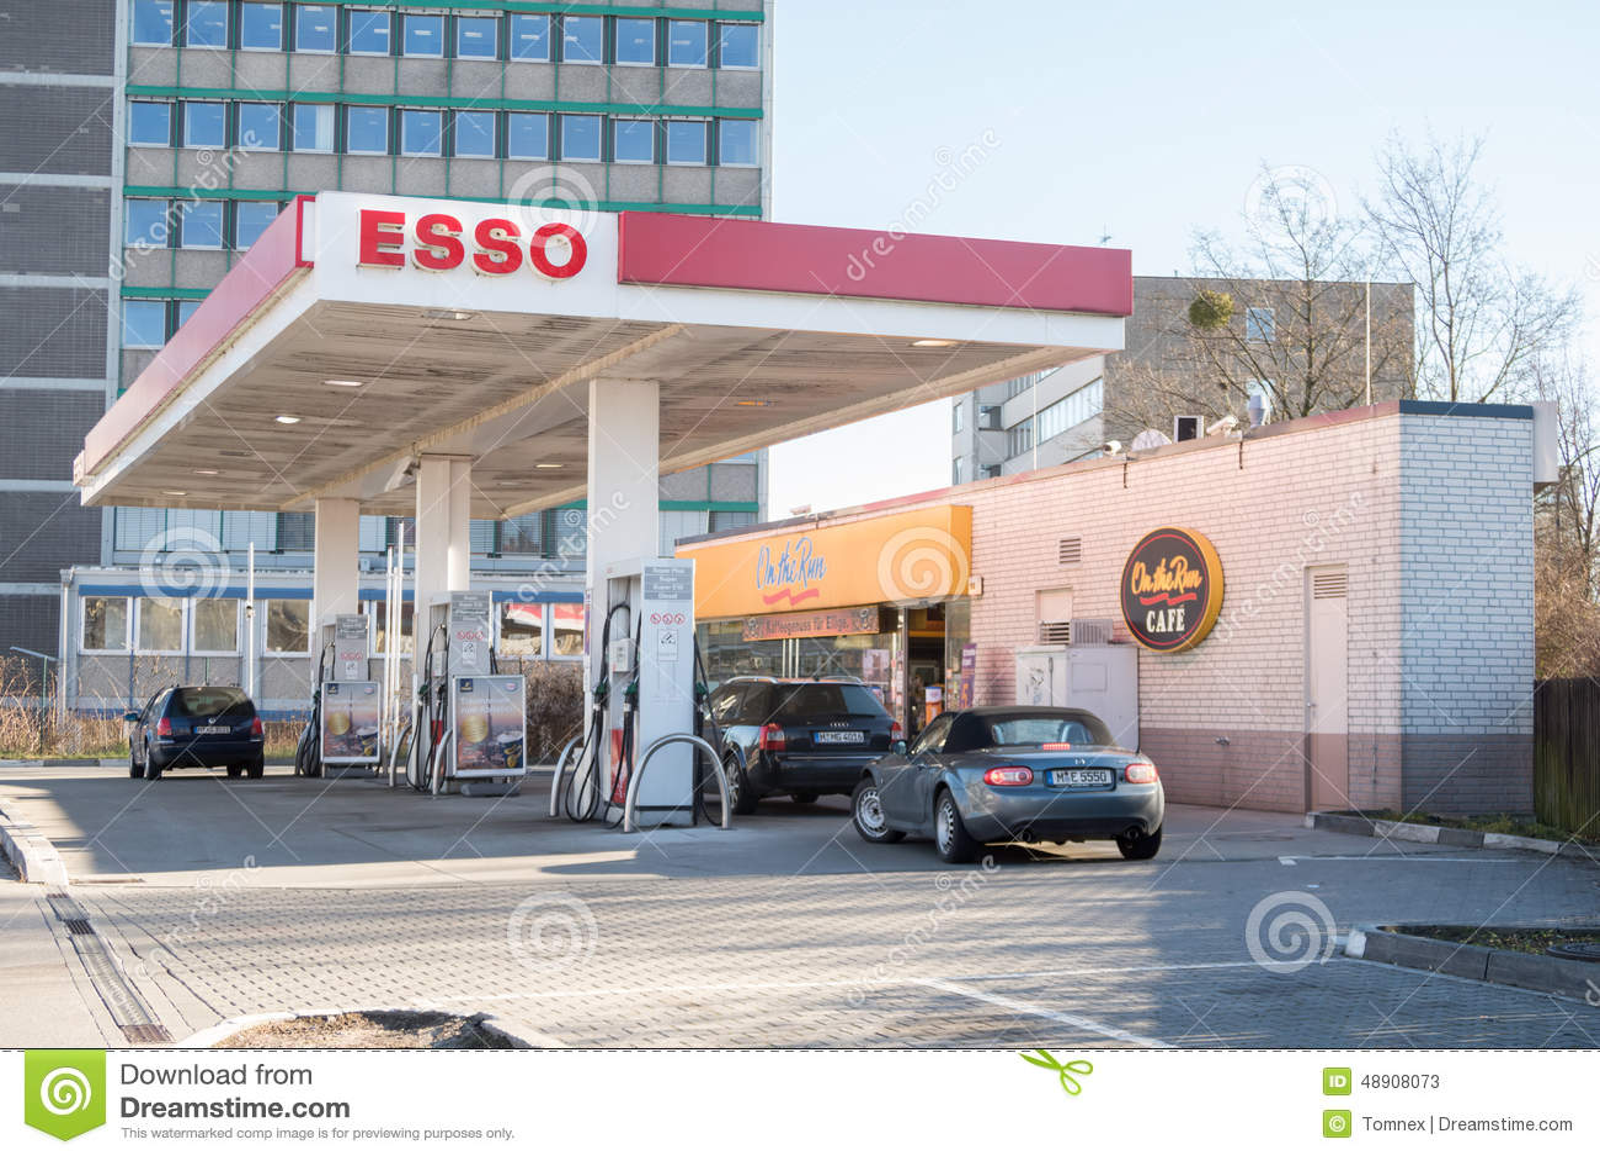 esso fuel station editorial stock photo image of fuel 48908073. Black Bedroom Furniture Sets. Home Design Ideas